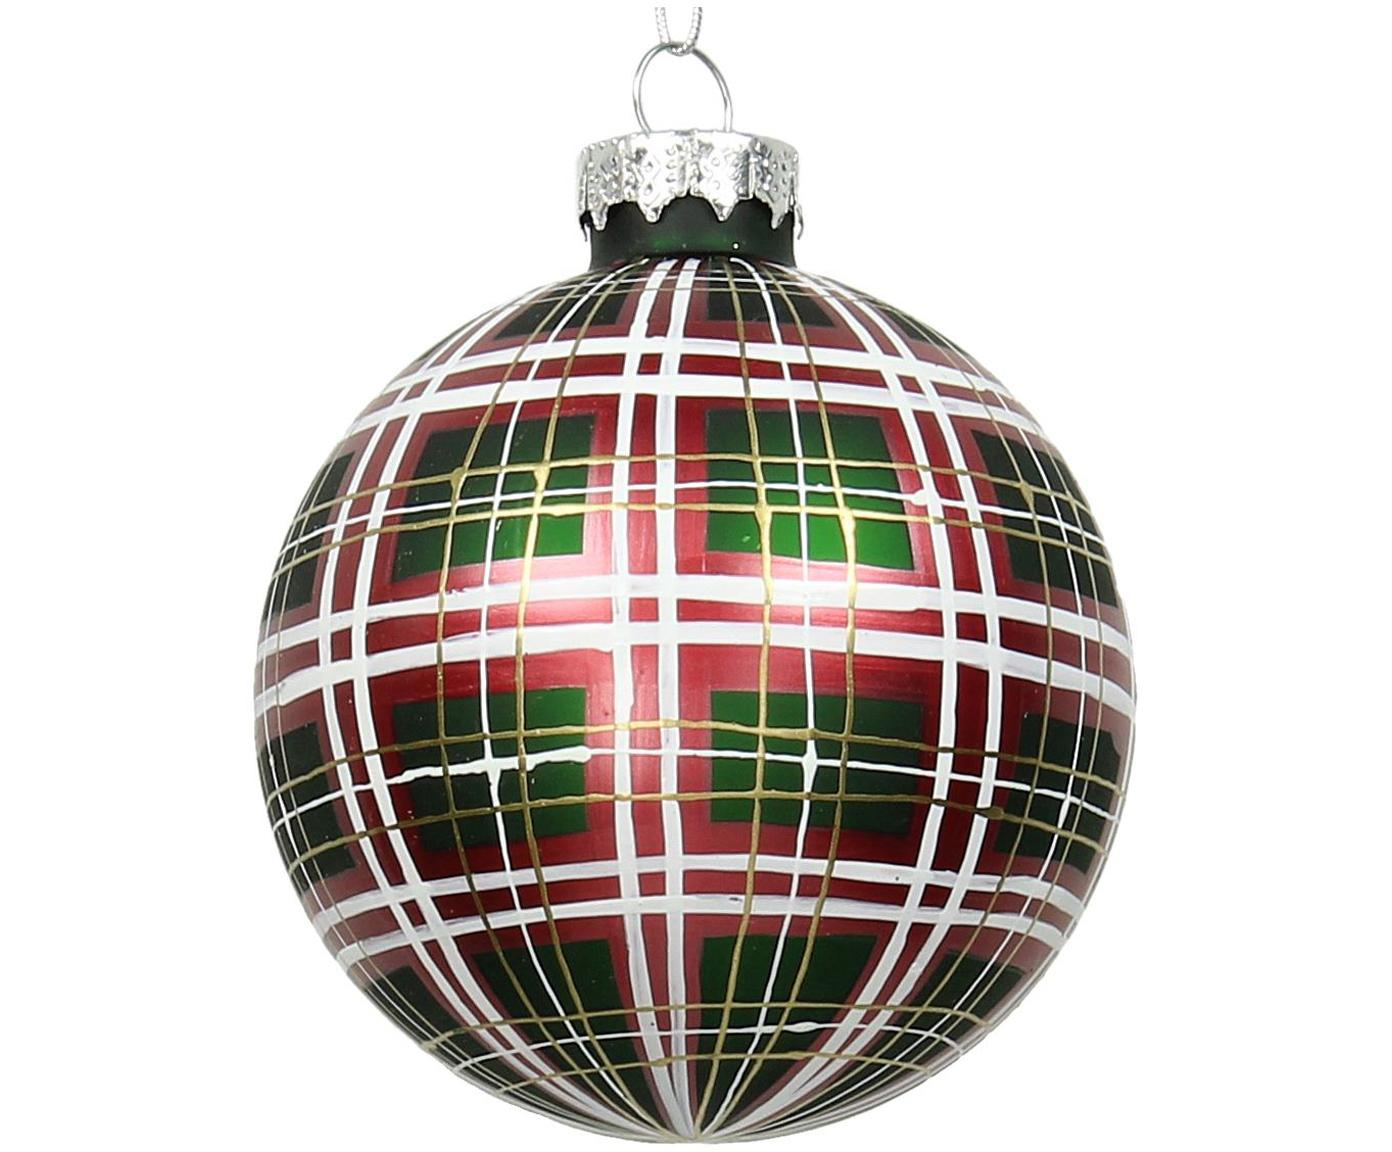 Weihnachtskugeln Karo Ø9cm, 2Stück, Grün, Rot, Weiss, Goldfarben, Ø 9 cm